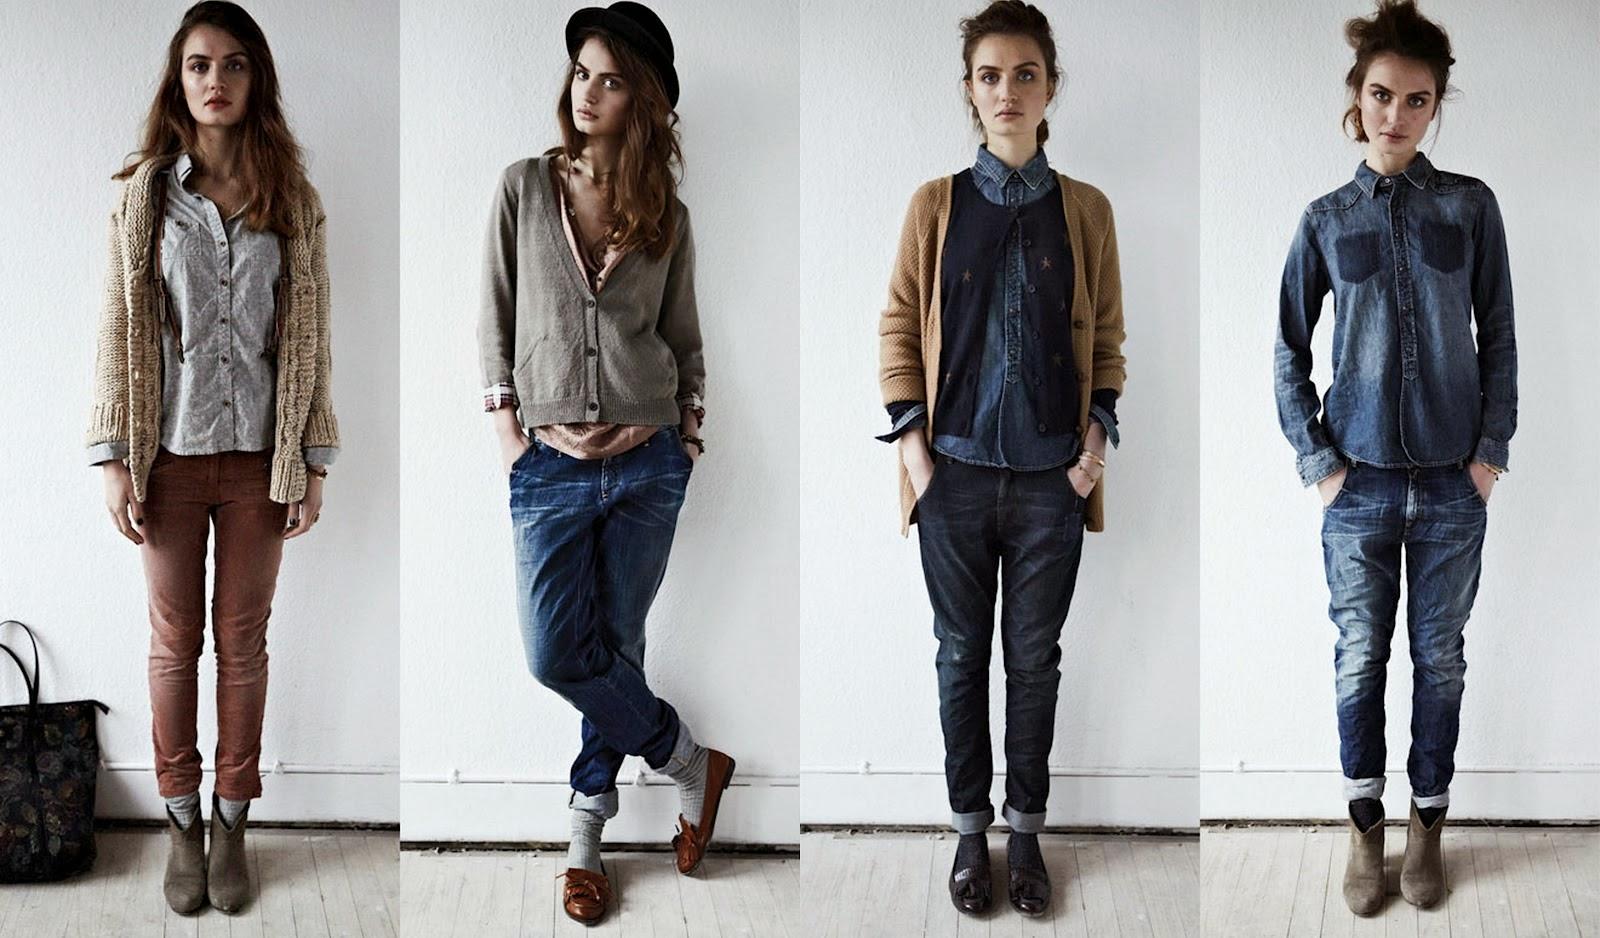 Maridadi Fashion News Blog What 39 S Your Style Boyish Boho Bohemian Hippy Casual Smart Retro